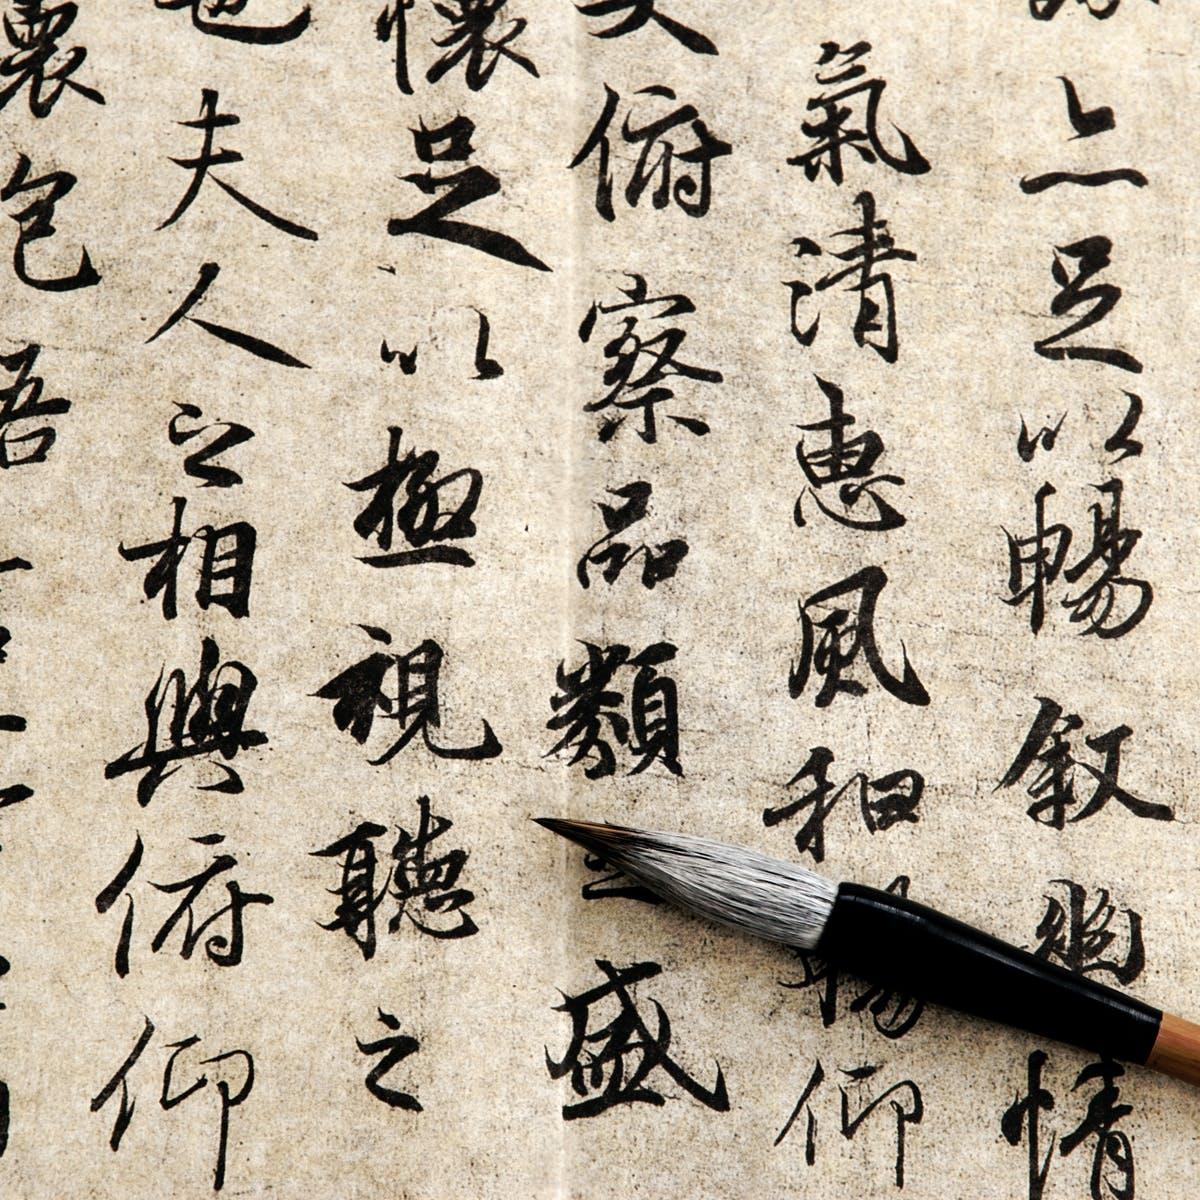 Китайский для начинающих (Chinese for beginners)